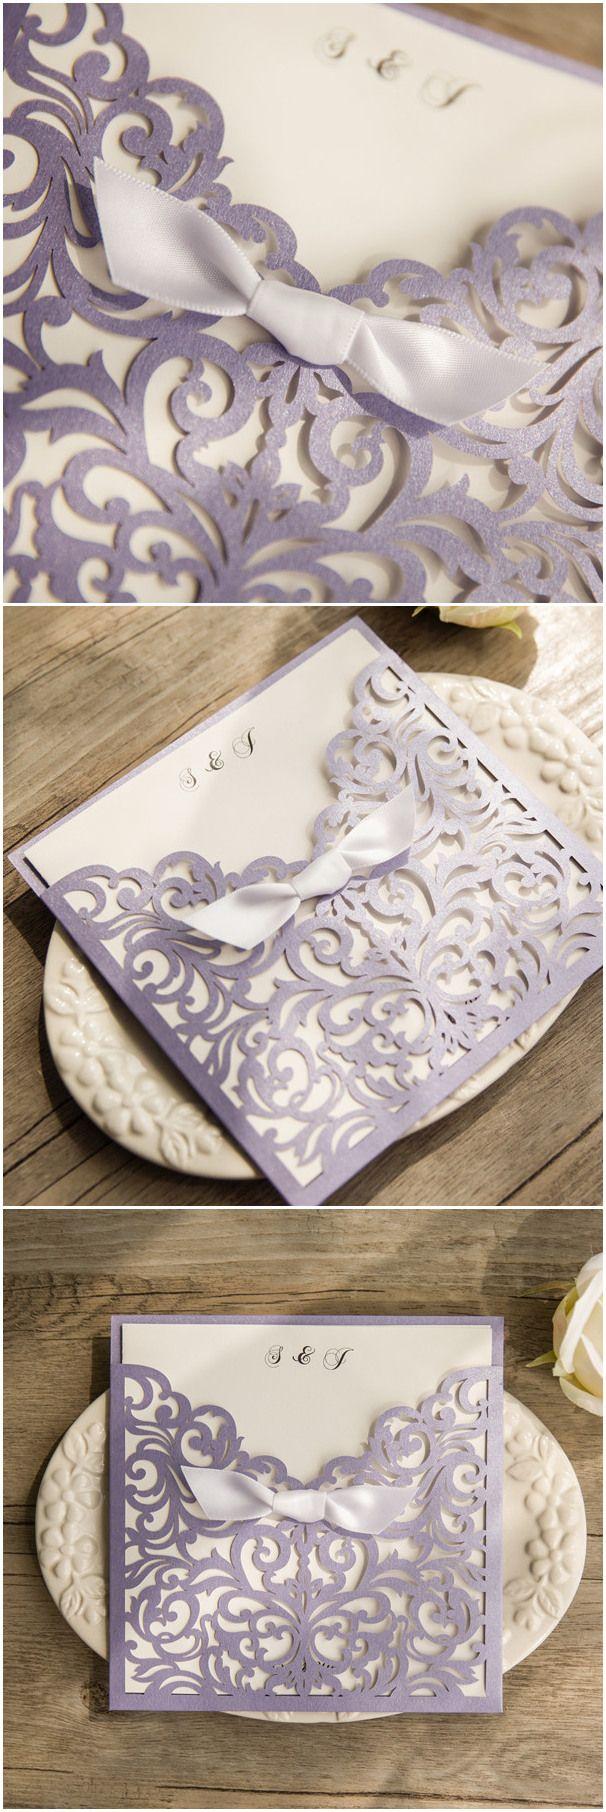 elegant wedding invitations, lavender wedding invitation cards-inspired by one of the most popular wedding colors @elegantwinvites